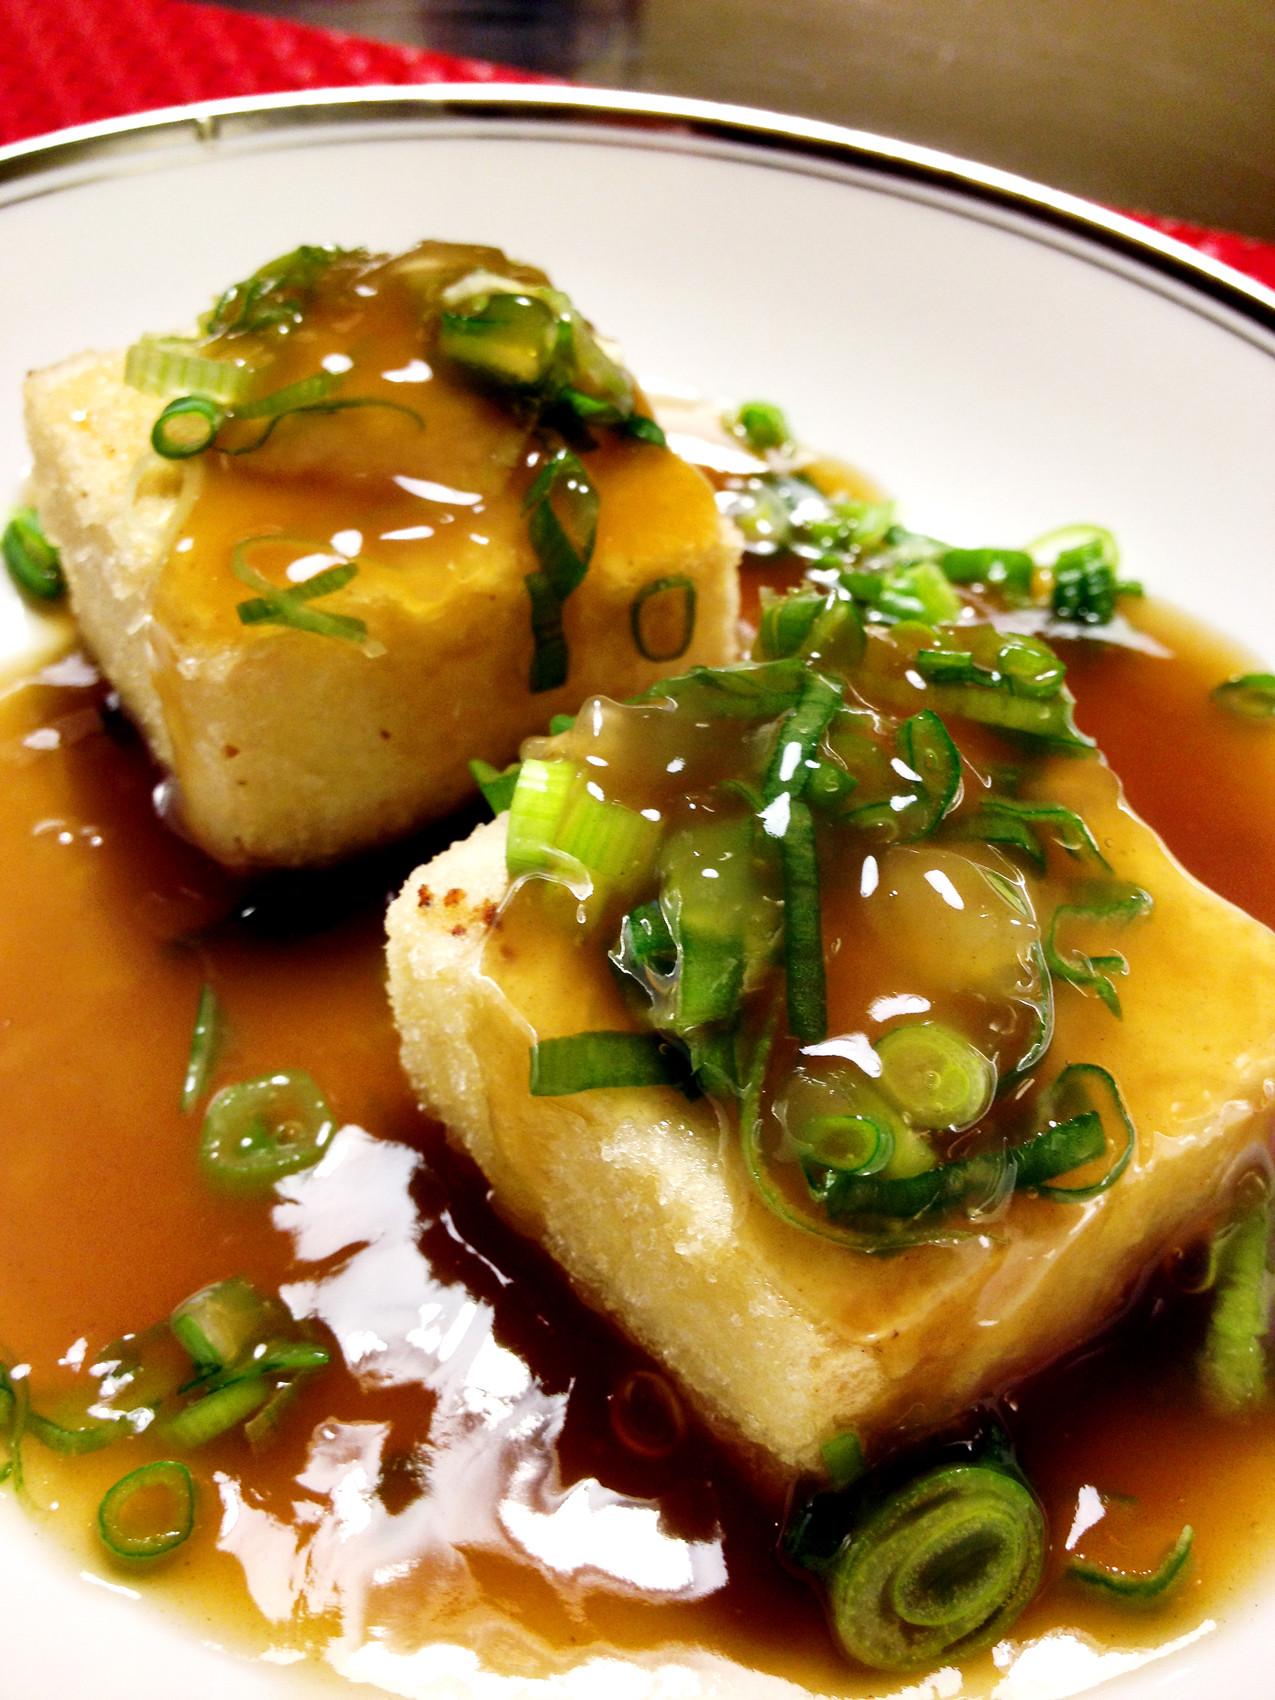 Japan Tofu Recipes  Agedashidofu Japanese Deep Fried Tofu 揚げ出し豆腐 BigOven